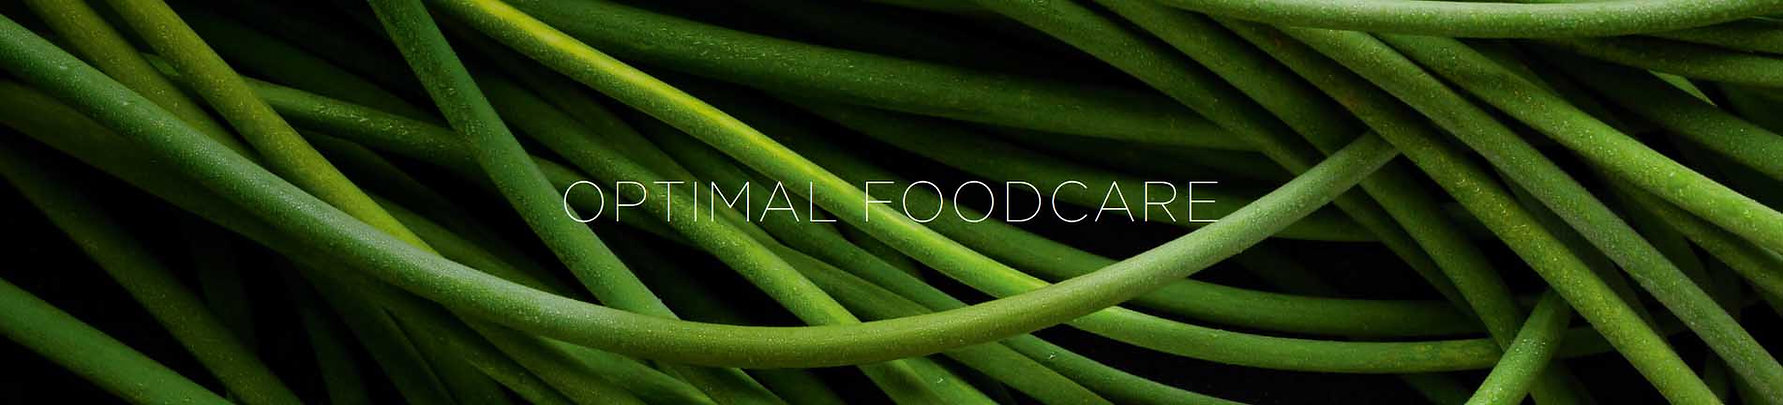 optimal food care.jpg